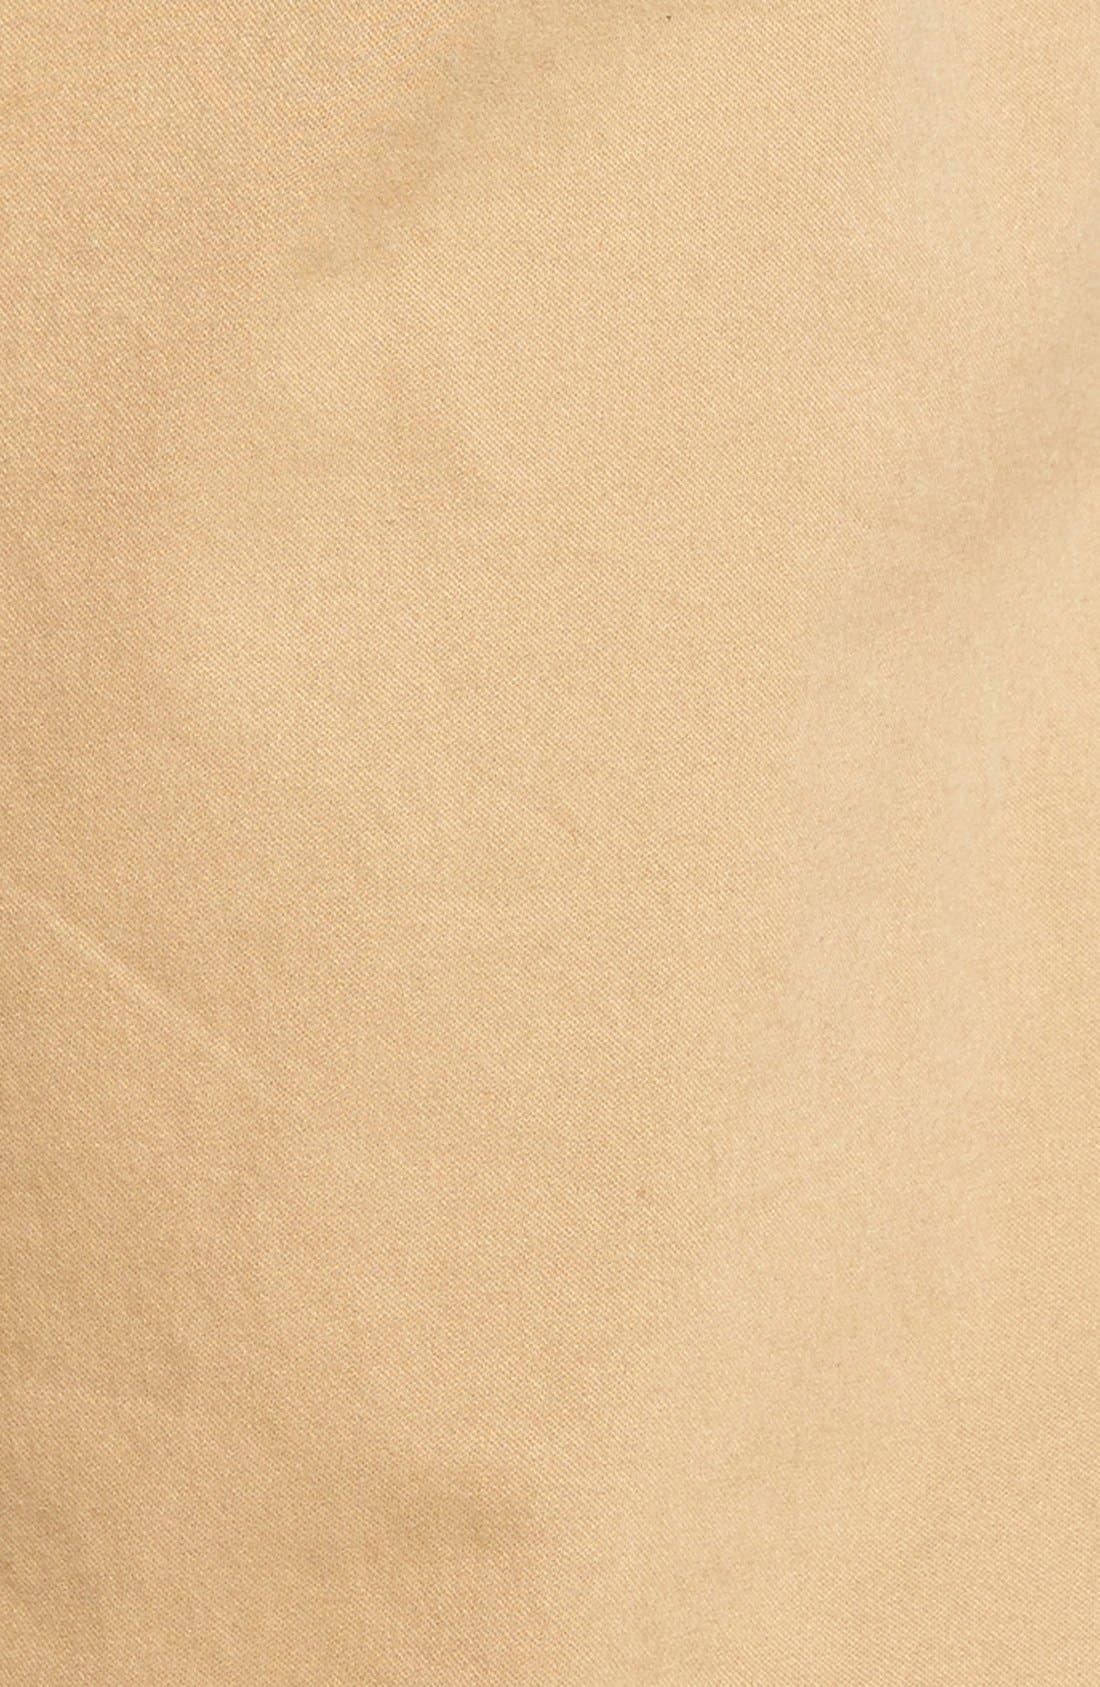 'Charisma' Classic Relaxed Fit Pants,                             Alternate thumbnail 4, color,                             BEIGE/ KHAKI